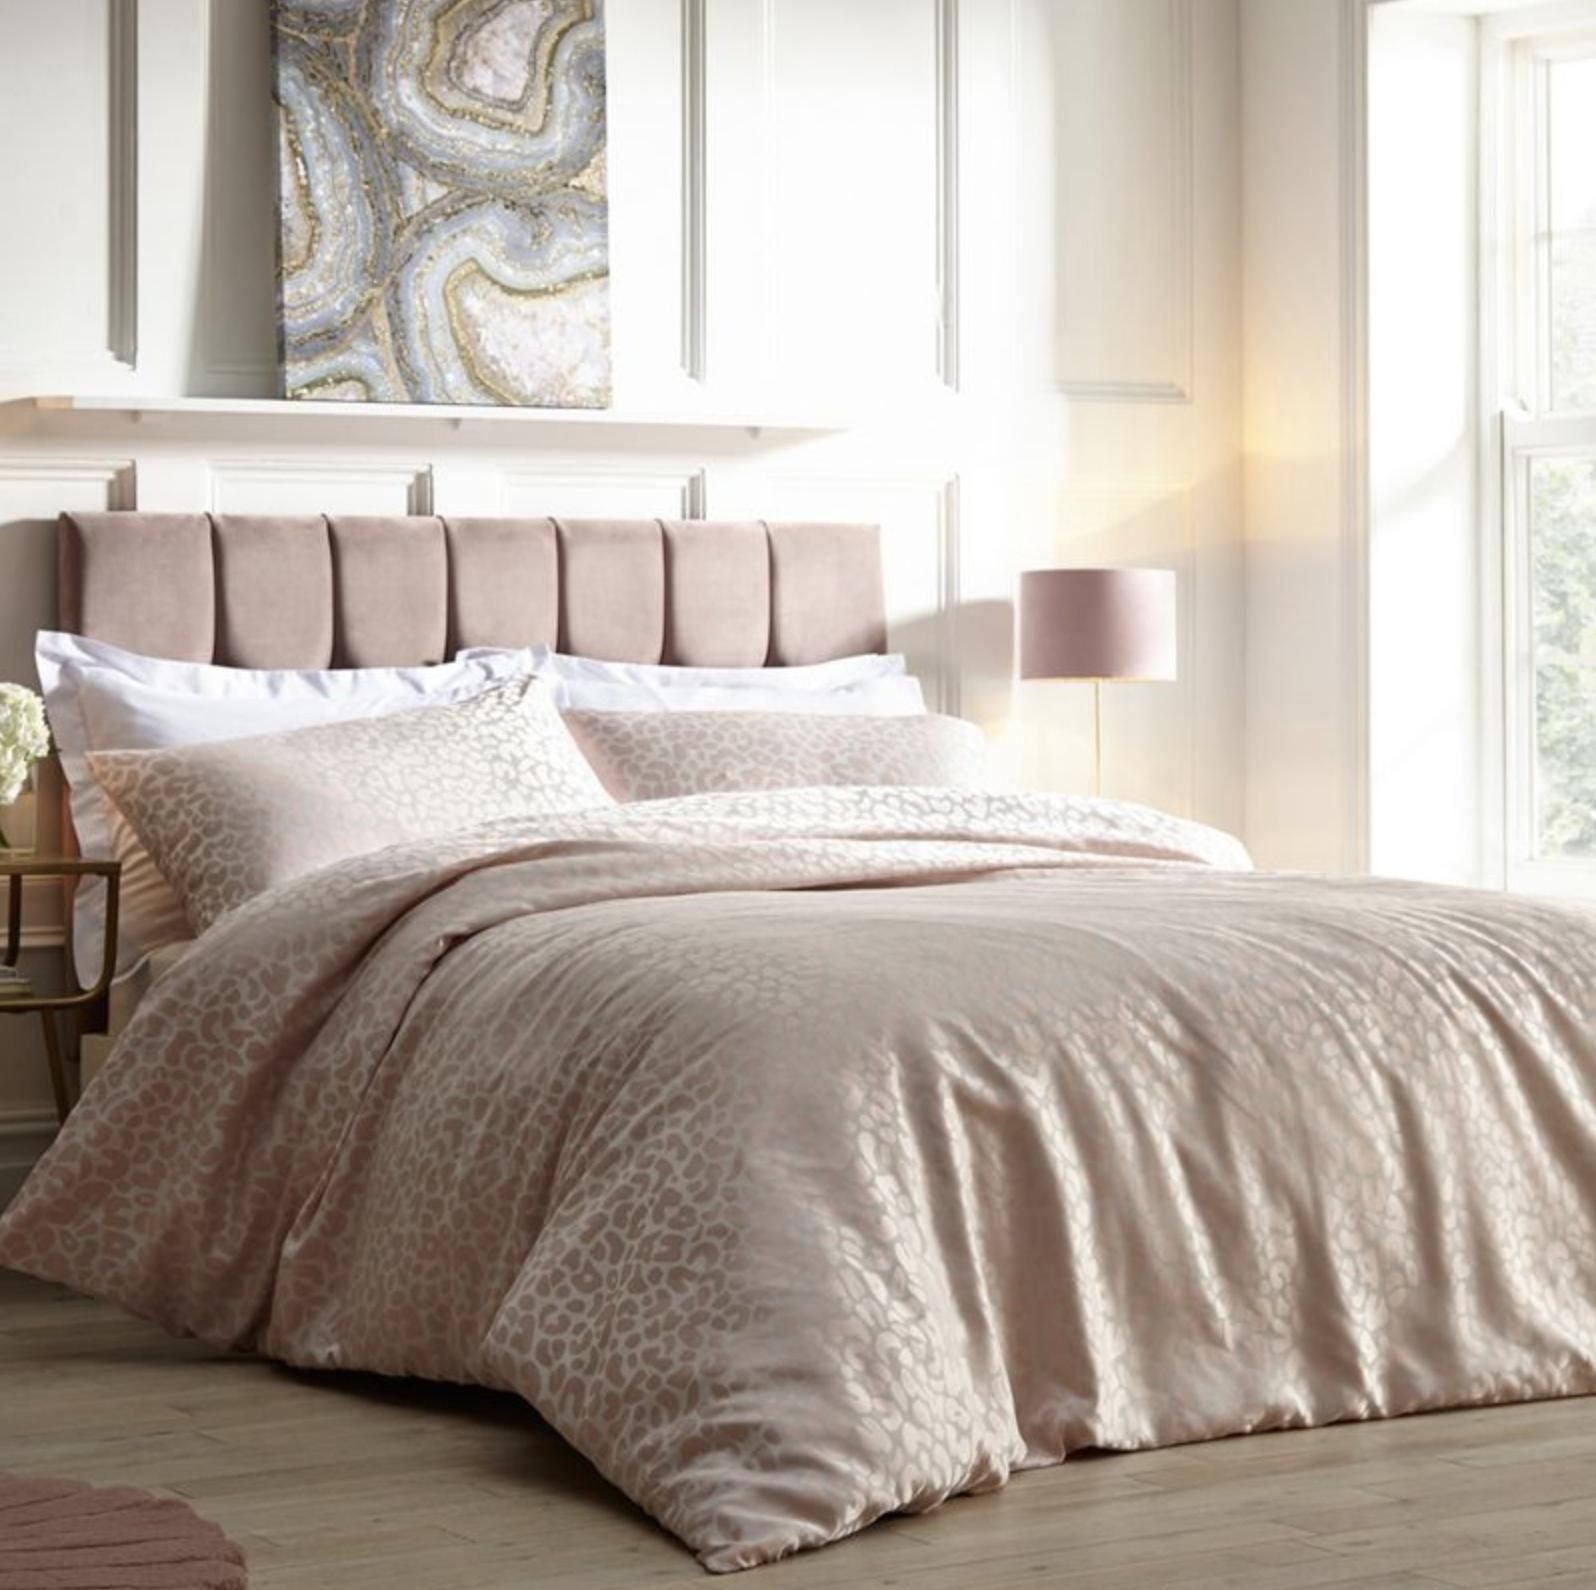 Elegant Bed Pillow 45x45cm Blush